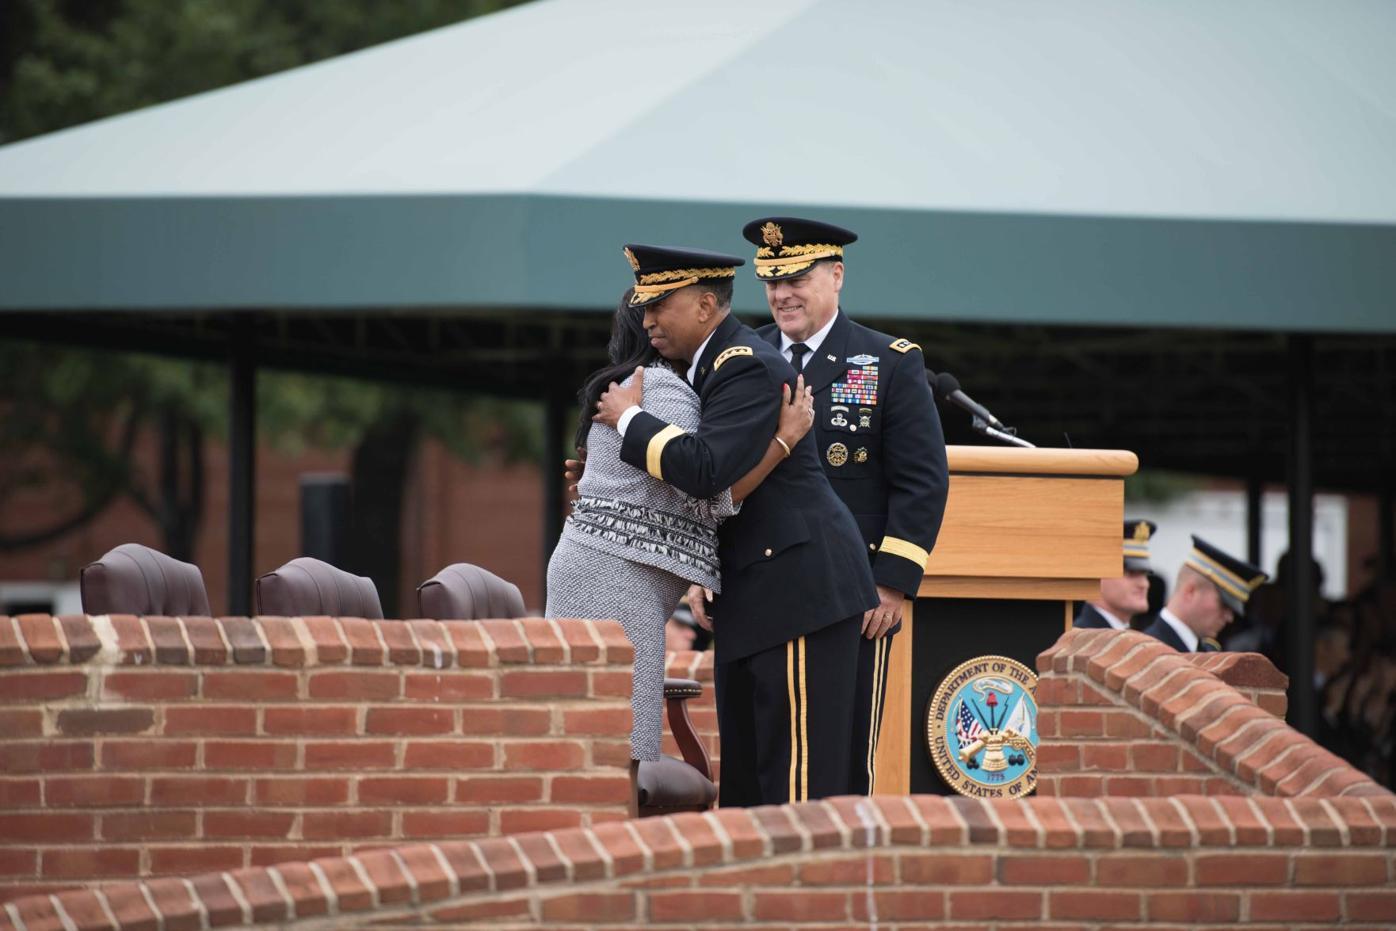 General Dennis L. Via retires